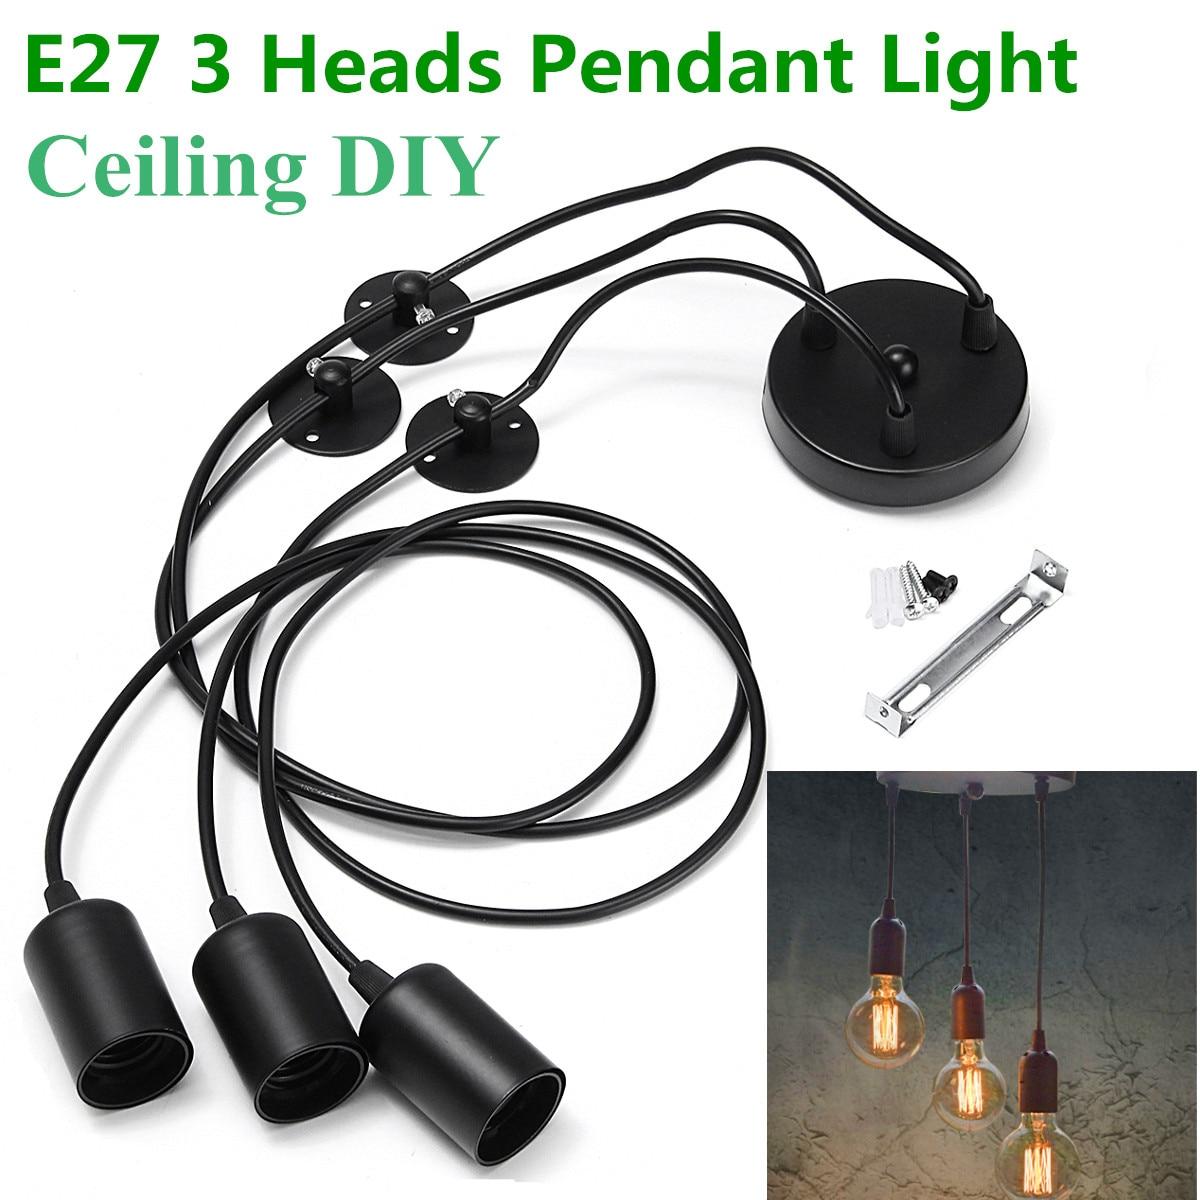 Smuxi Black E27 3 Heads Pendant Light Vintage Industrial Edison Ceiling Lamp  Dining Lighting Retro Pendant Lamp